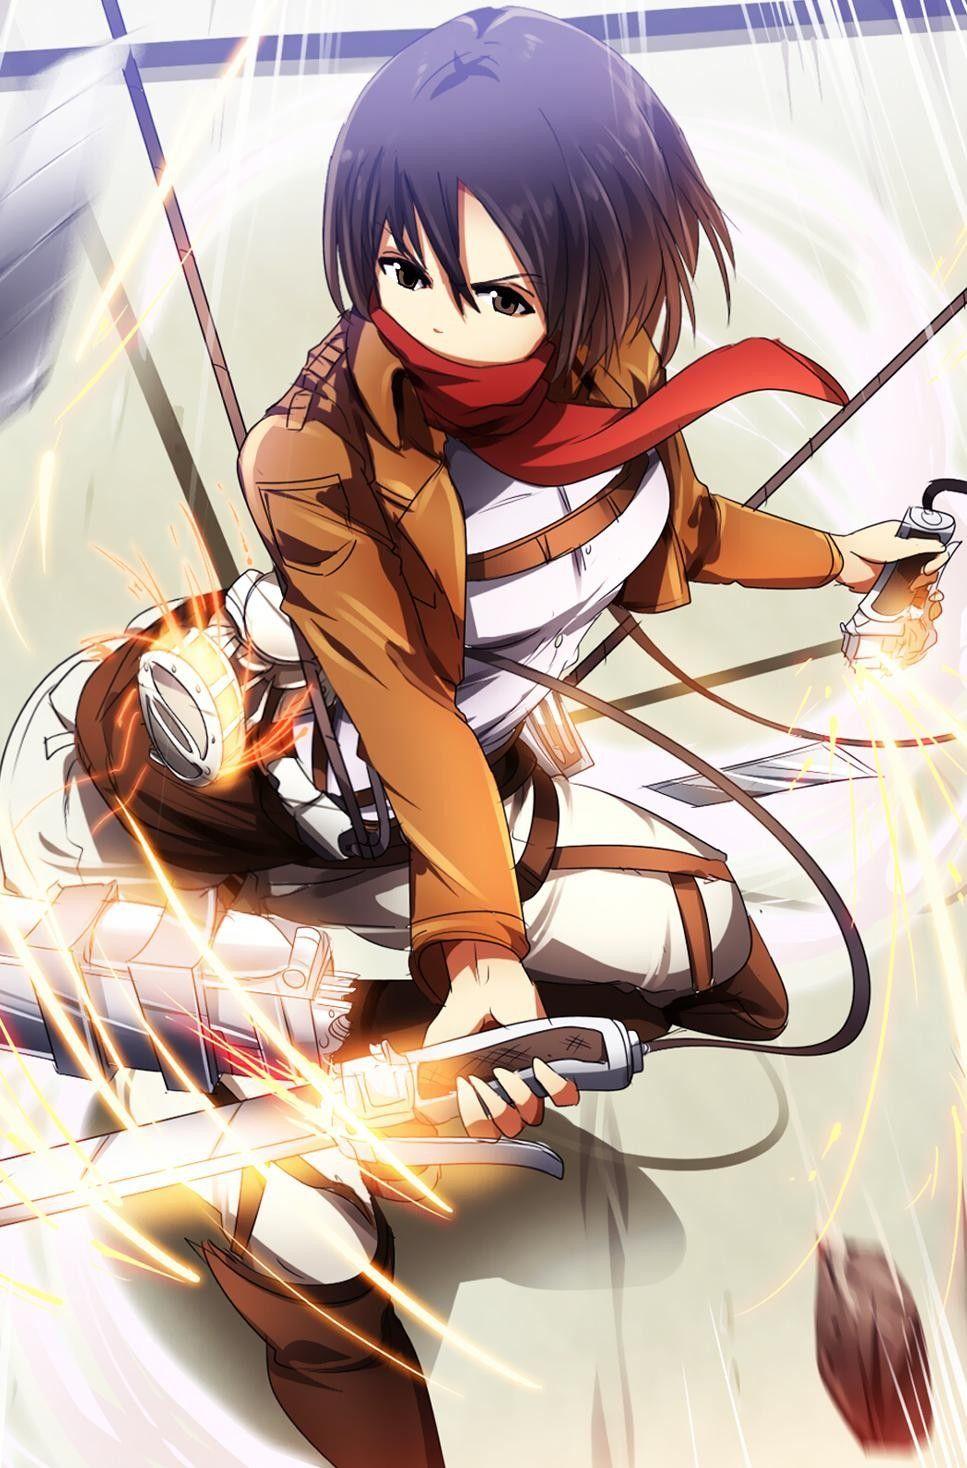 Image__555657_1508857131 Anime, Attack on titan art